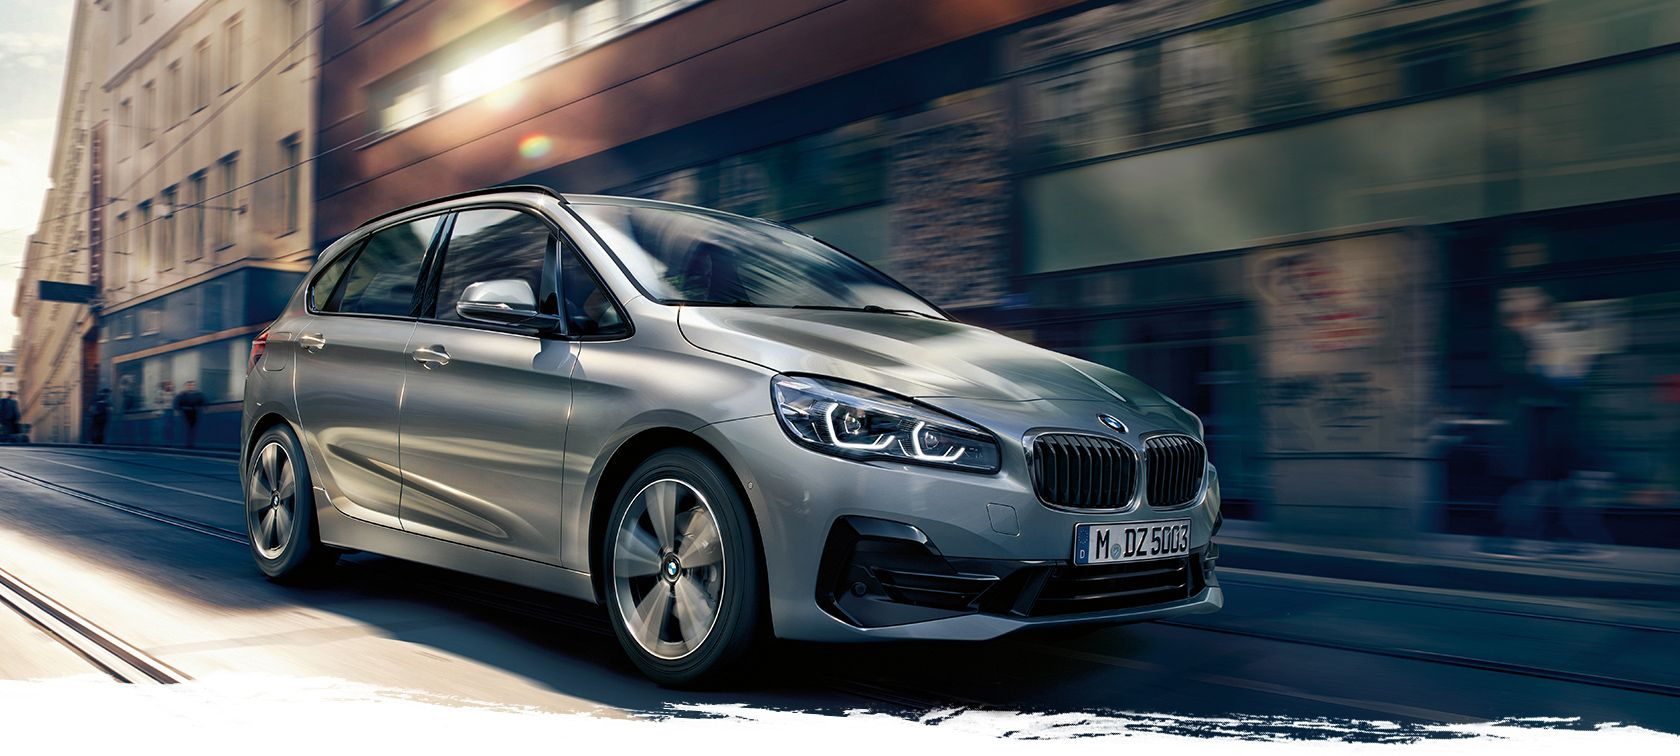 BMW Wagner - BMW i3 Angebot